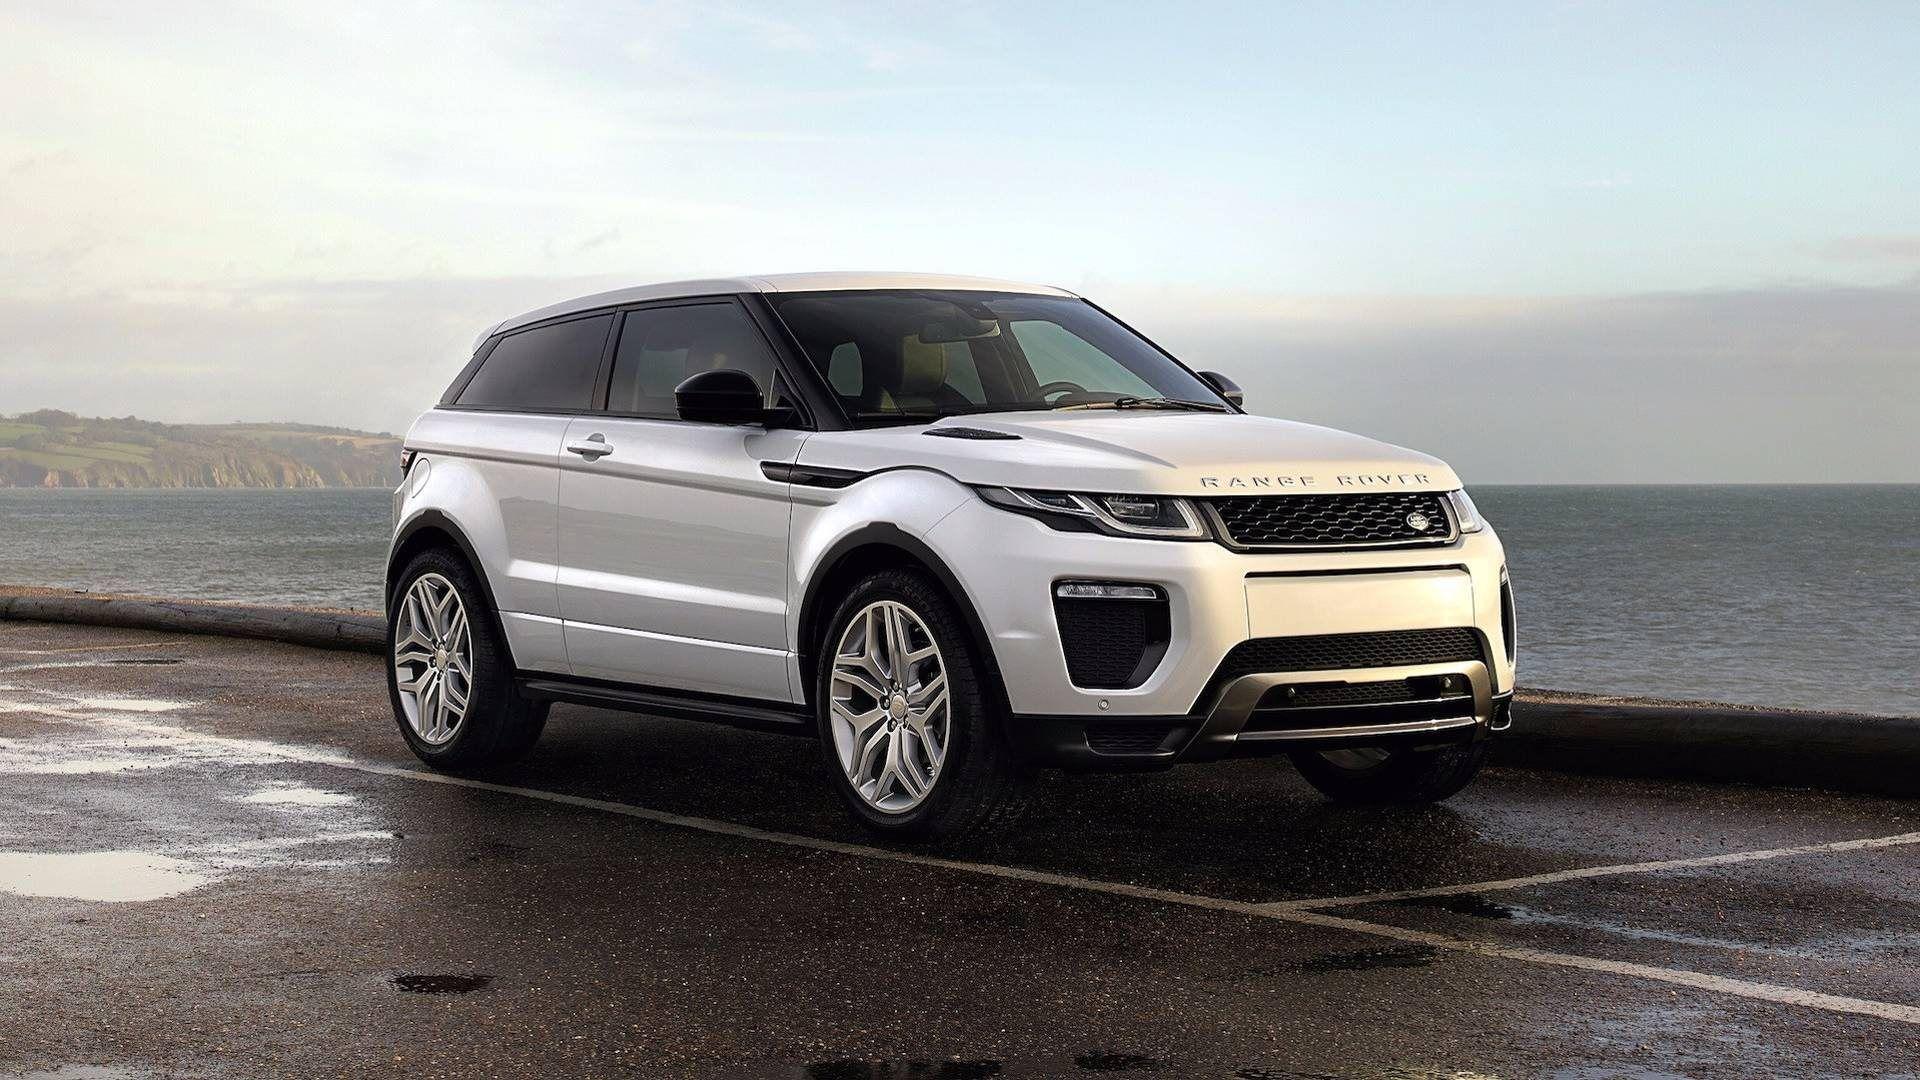 2021 Range Rover Evoque Release Date Range Rover Evoque Range Rover Range Rover Evoque Coupe